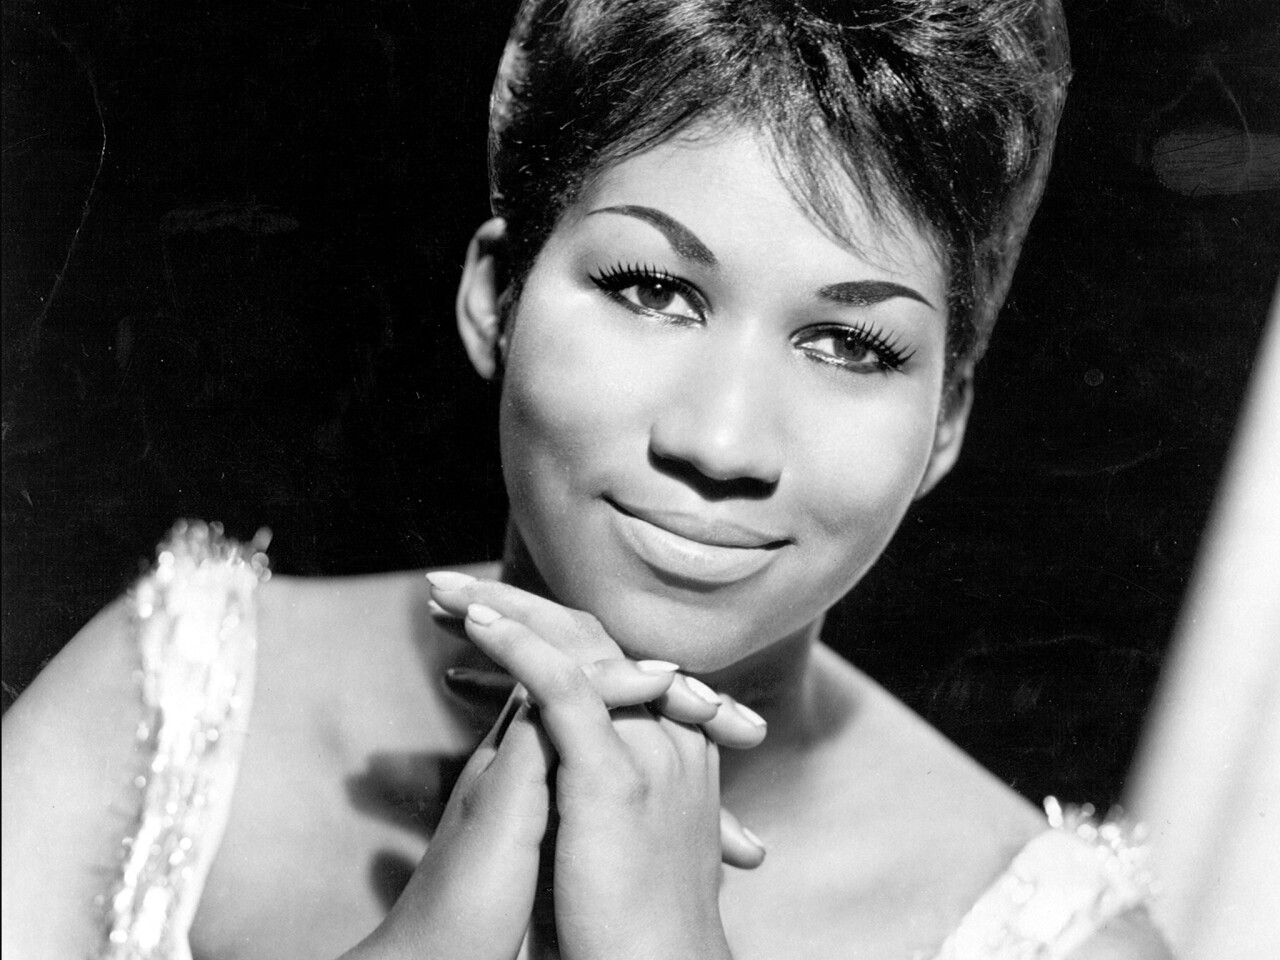 Soul singer Aretha Franklin in a publicity shot circa 1964.